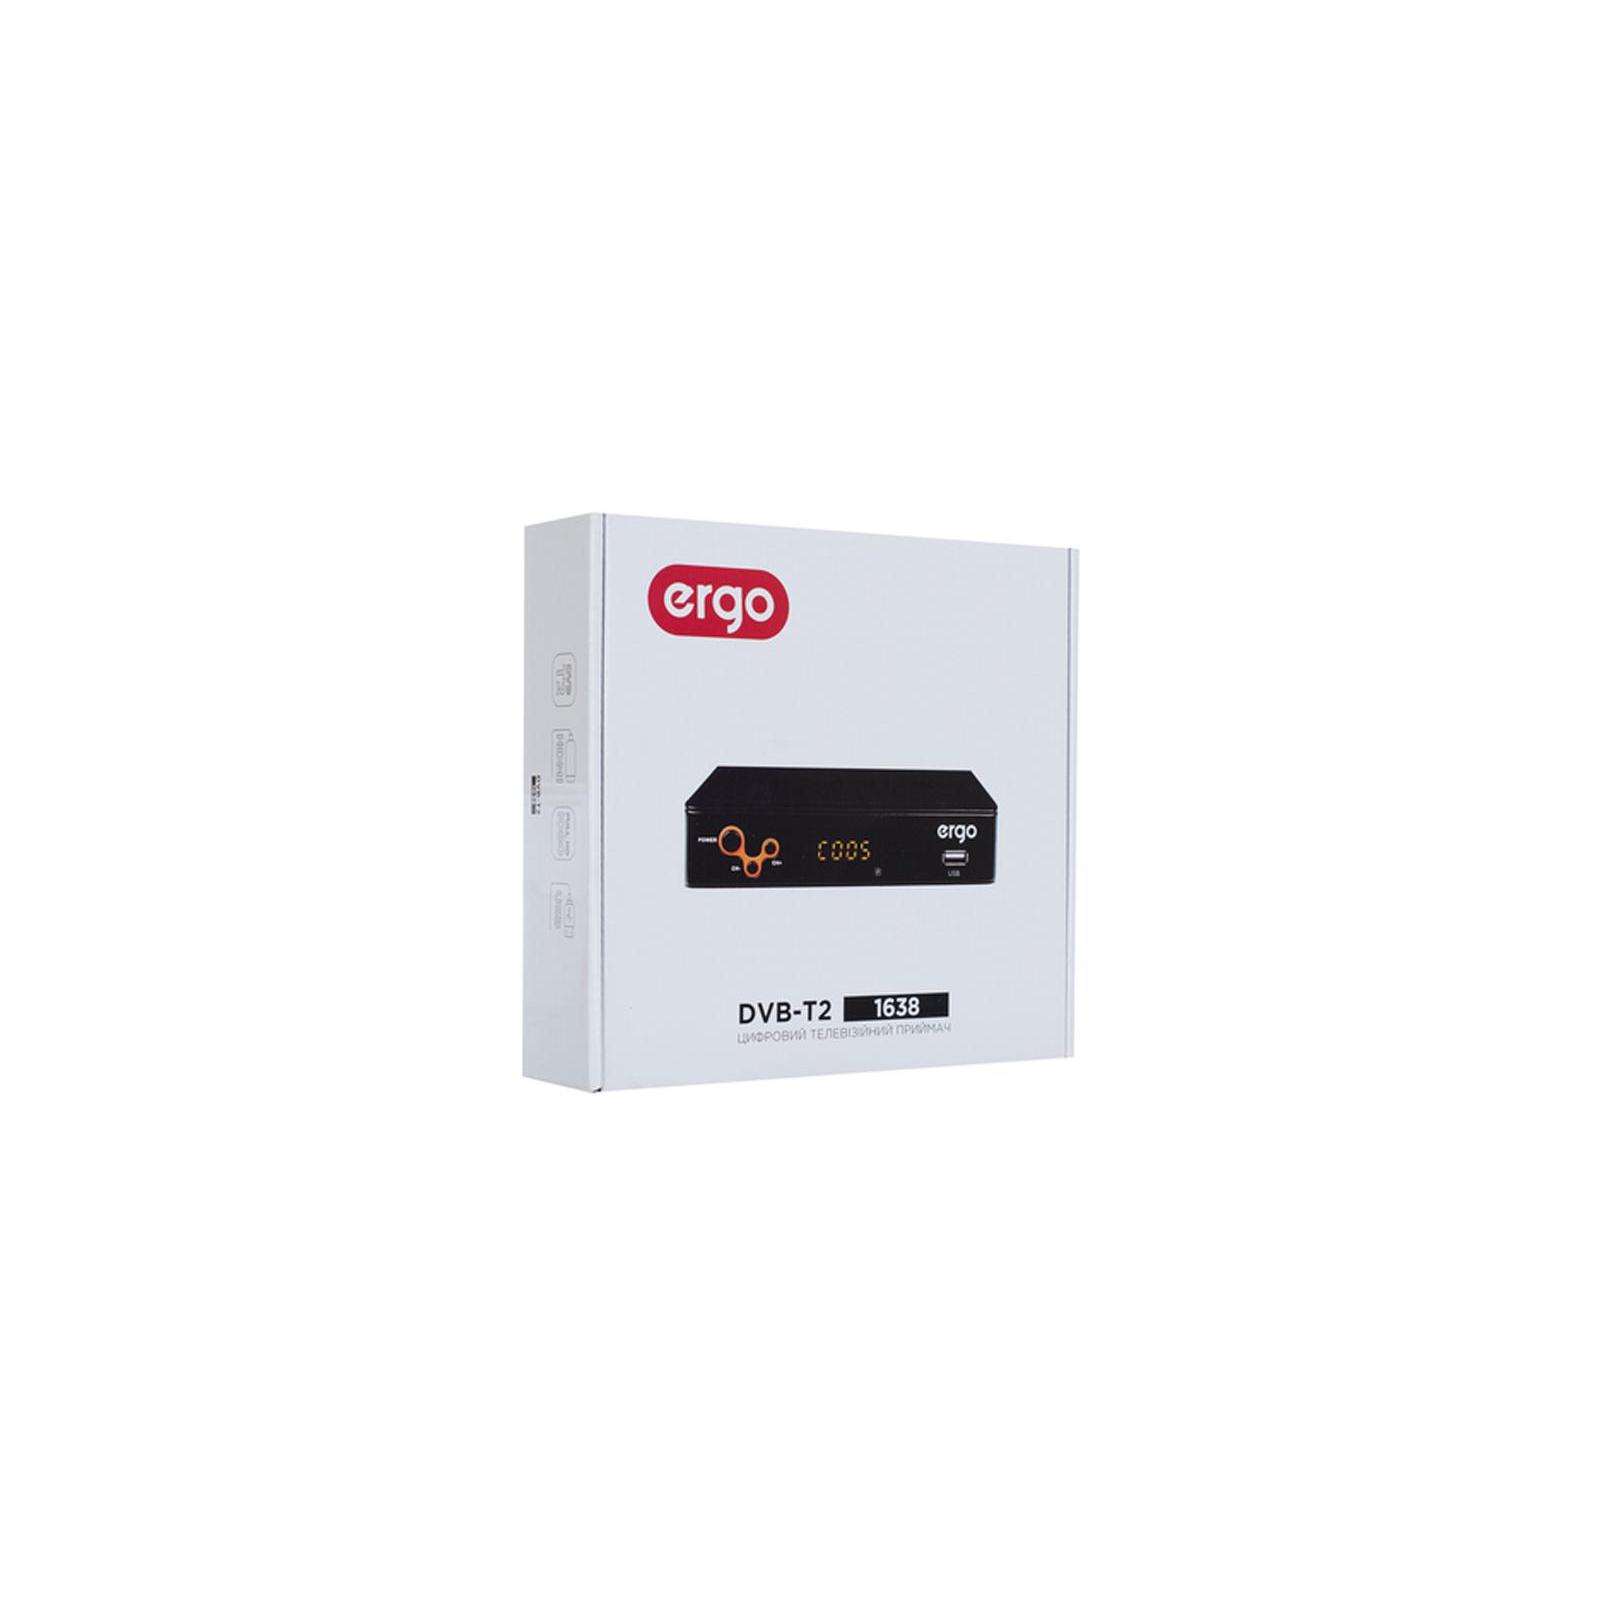 ТВ тюнер Ergo 1638 (DVB-T, DVB-T2) (STB-1638) зображення 8